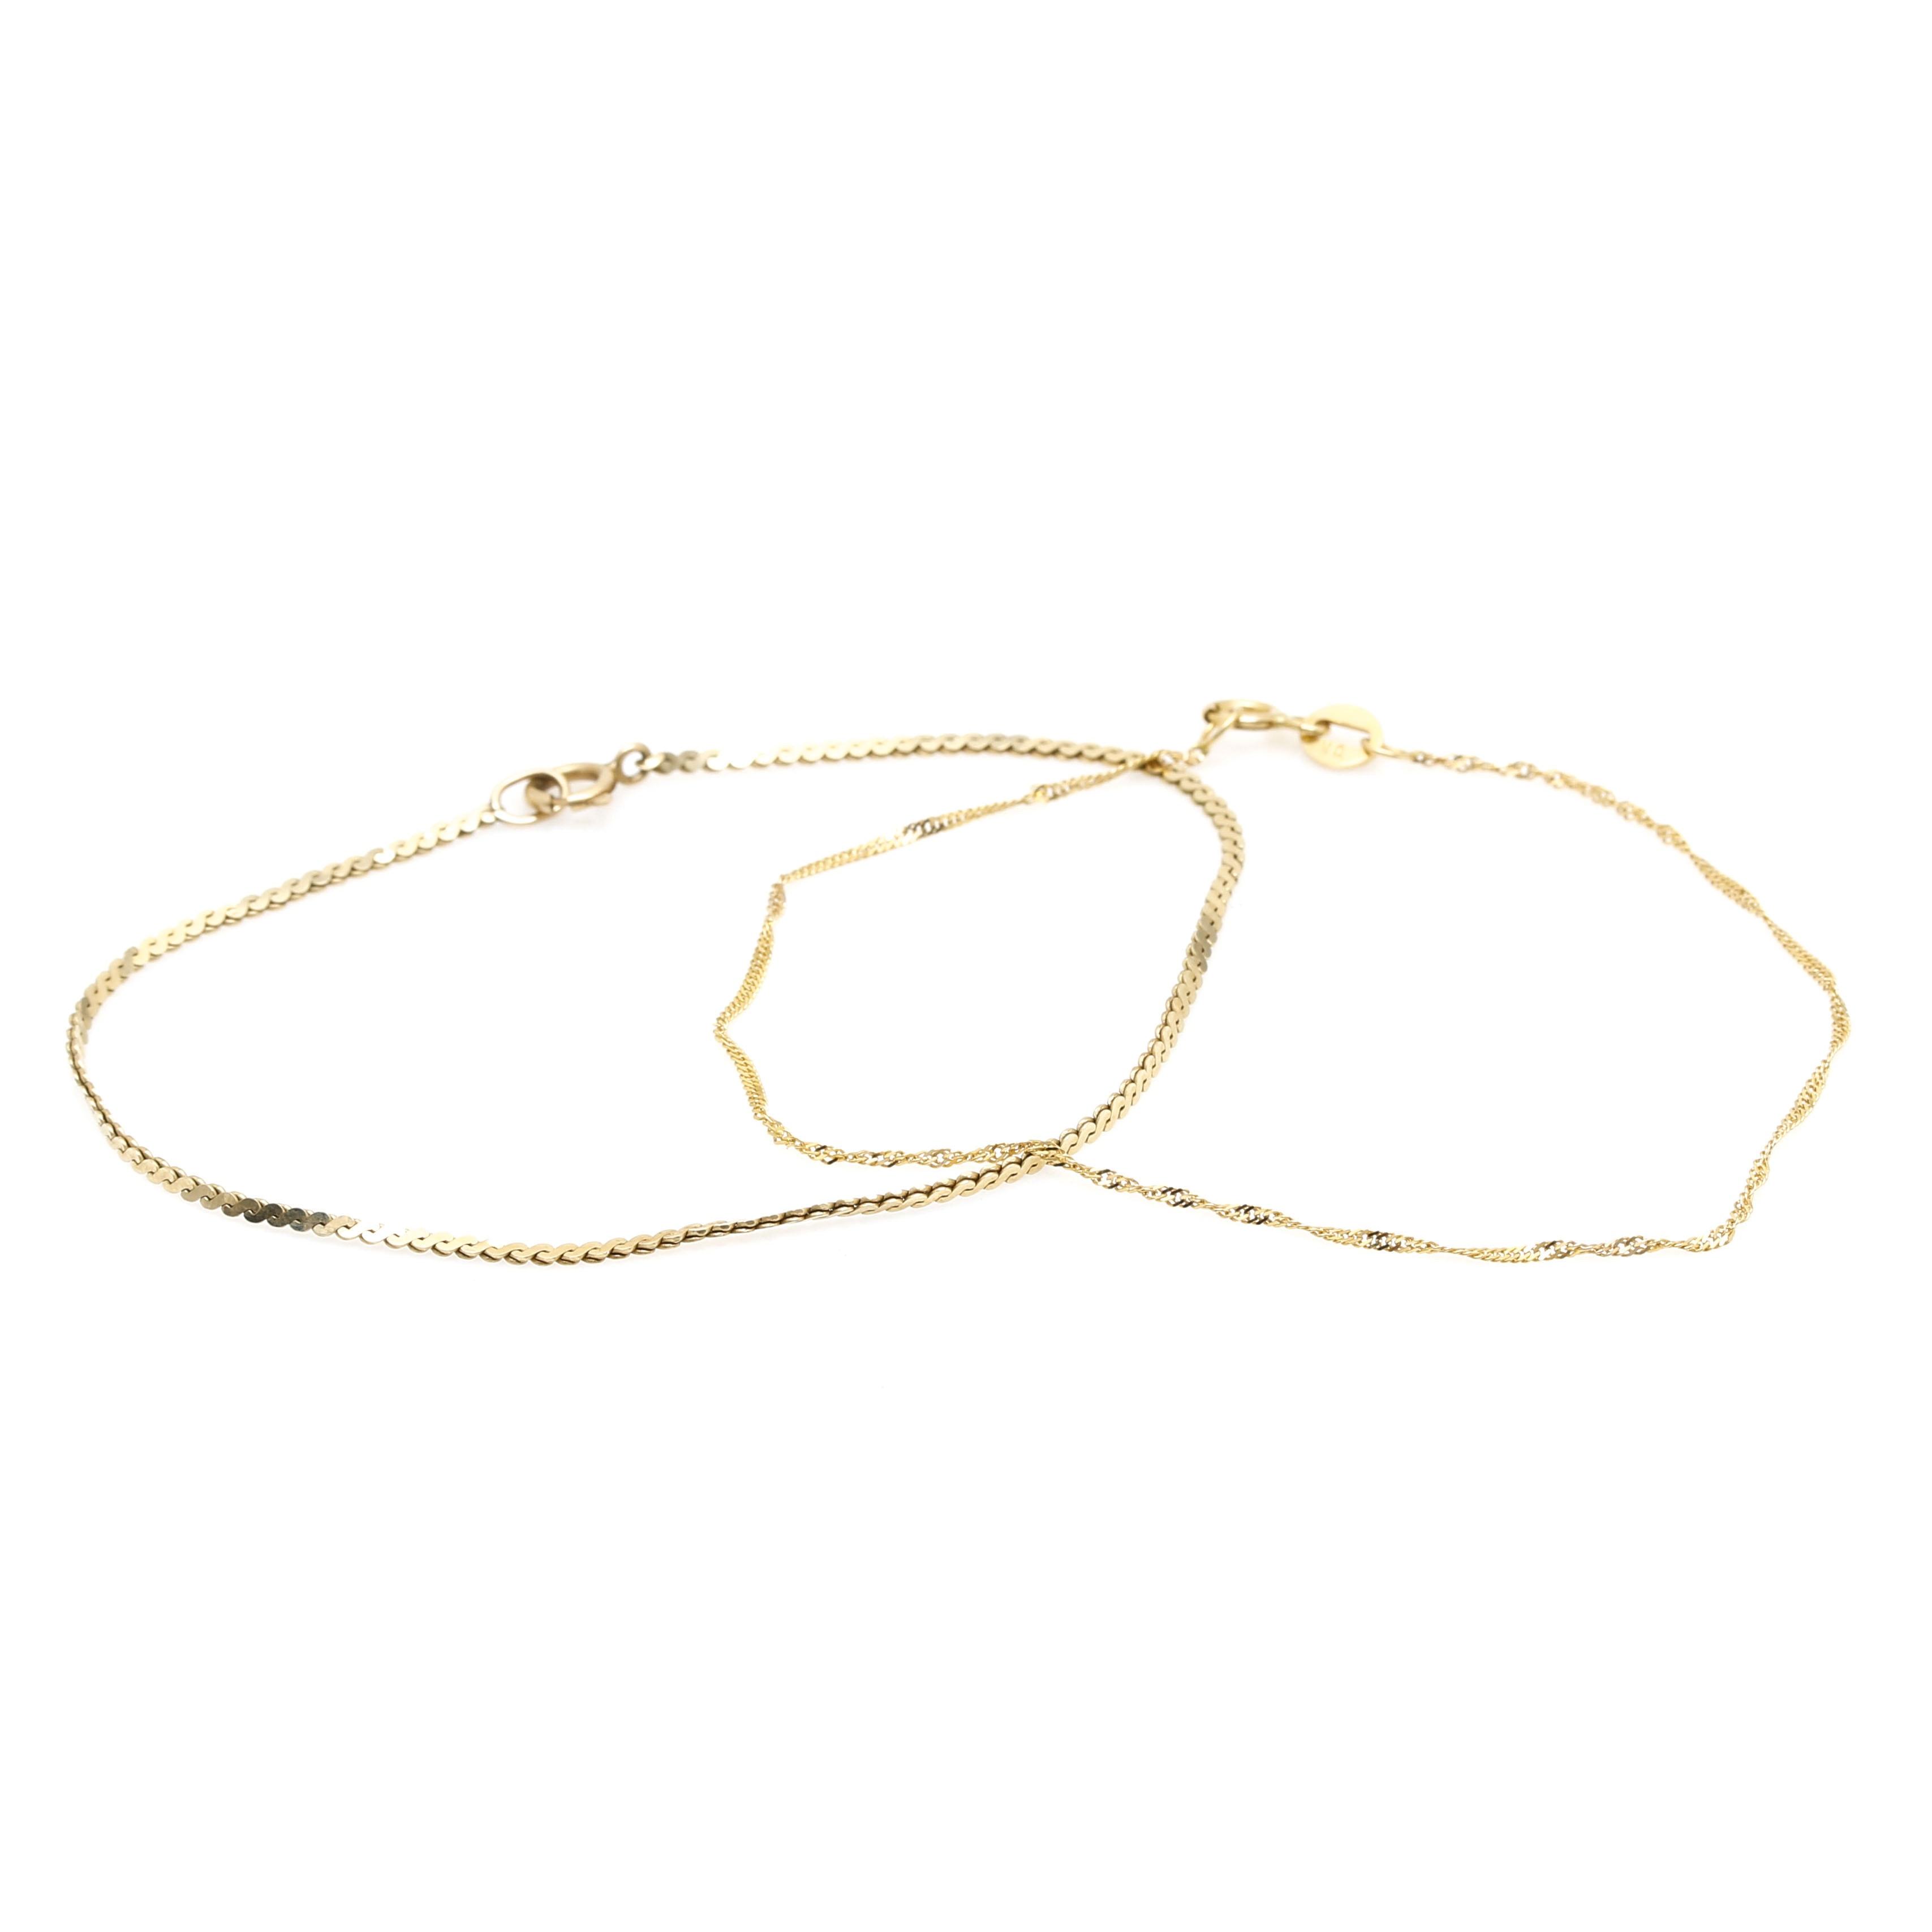 Pair of 14K Yellow Gold Bracelets